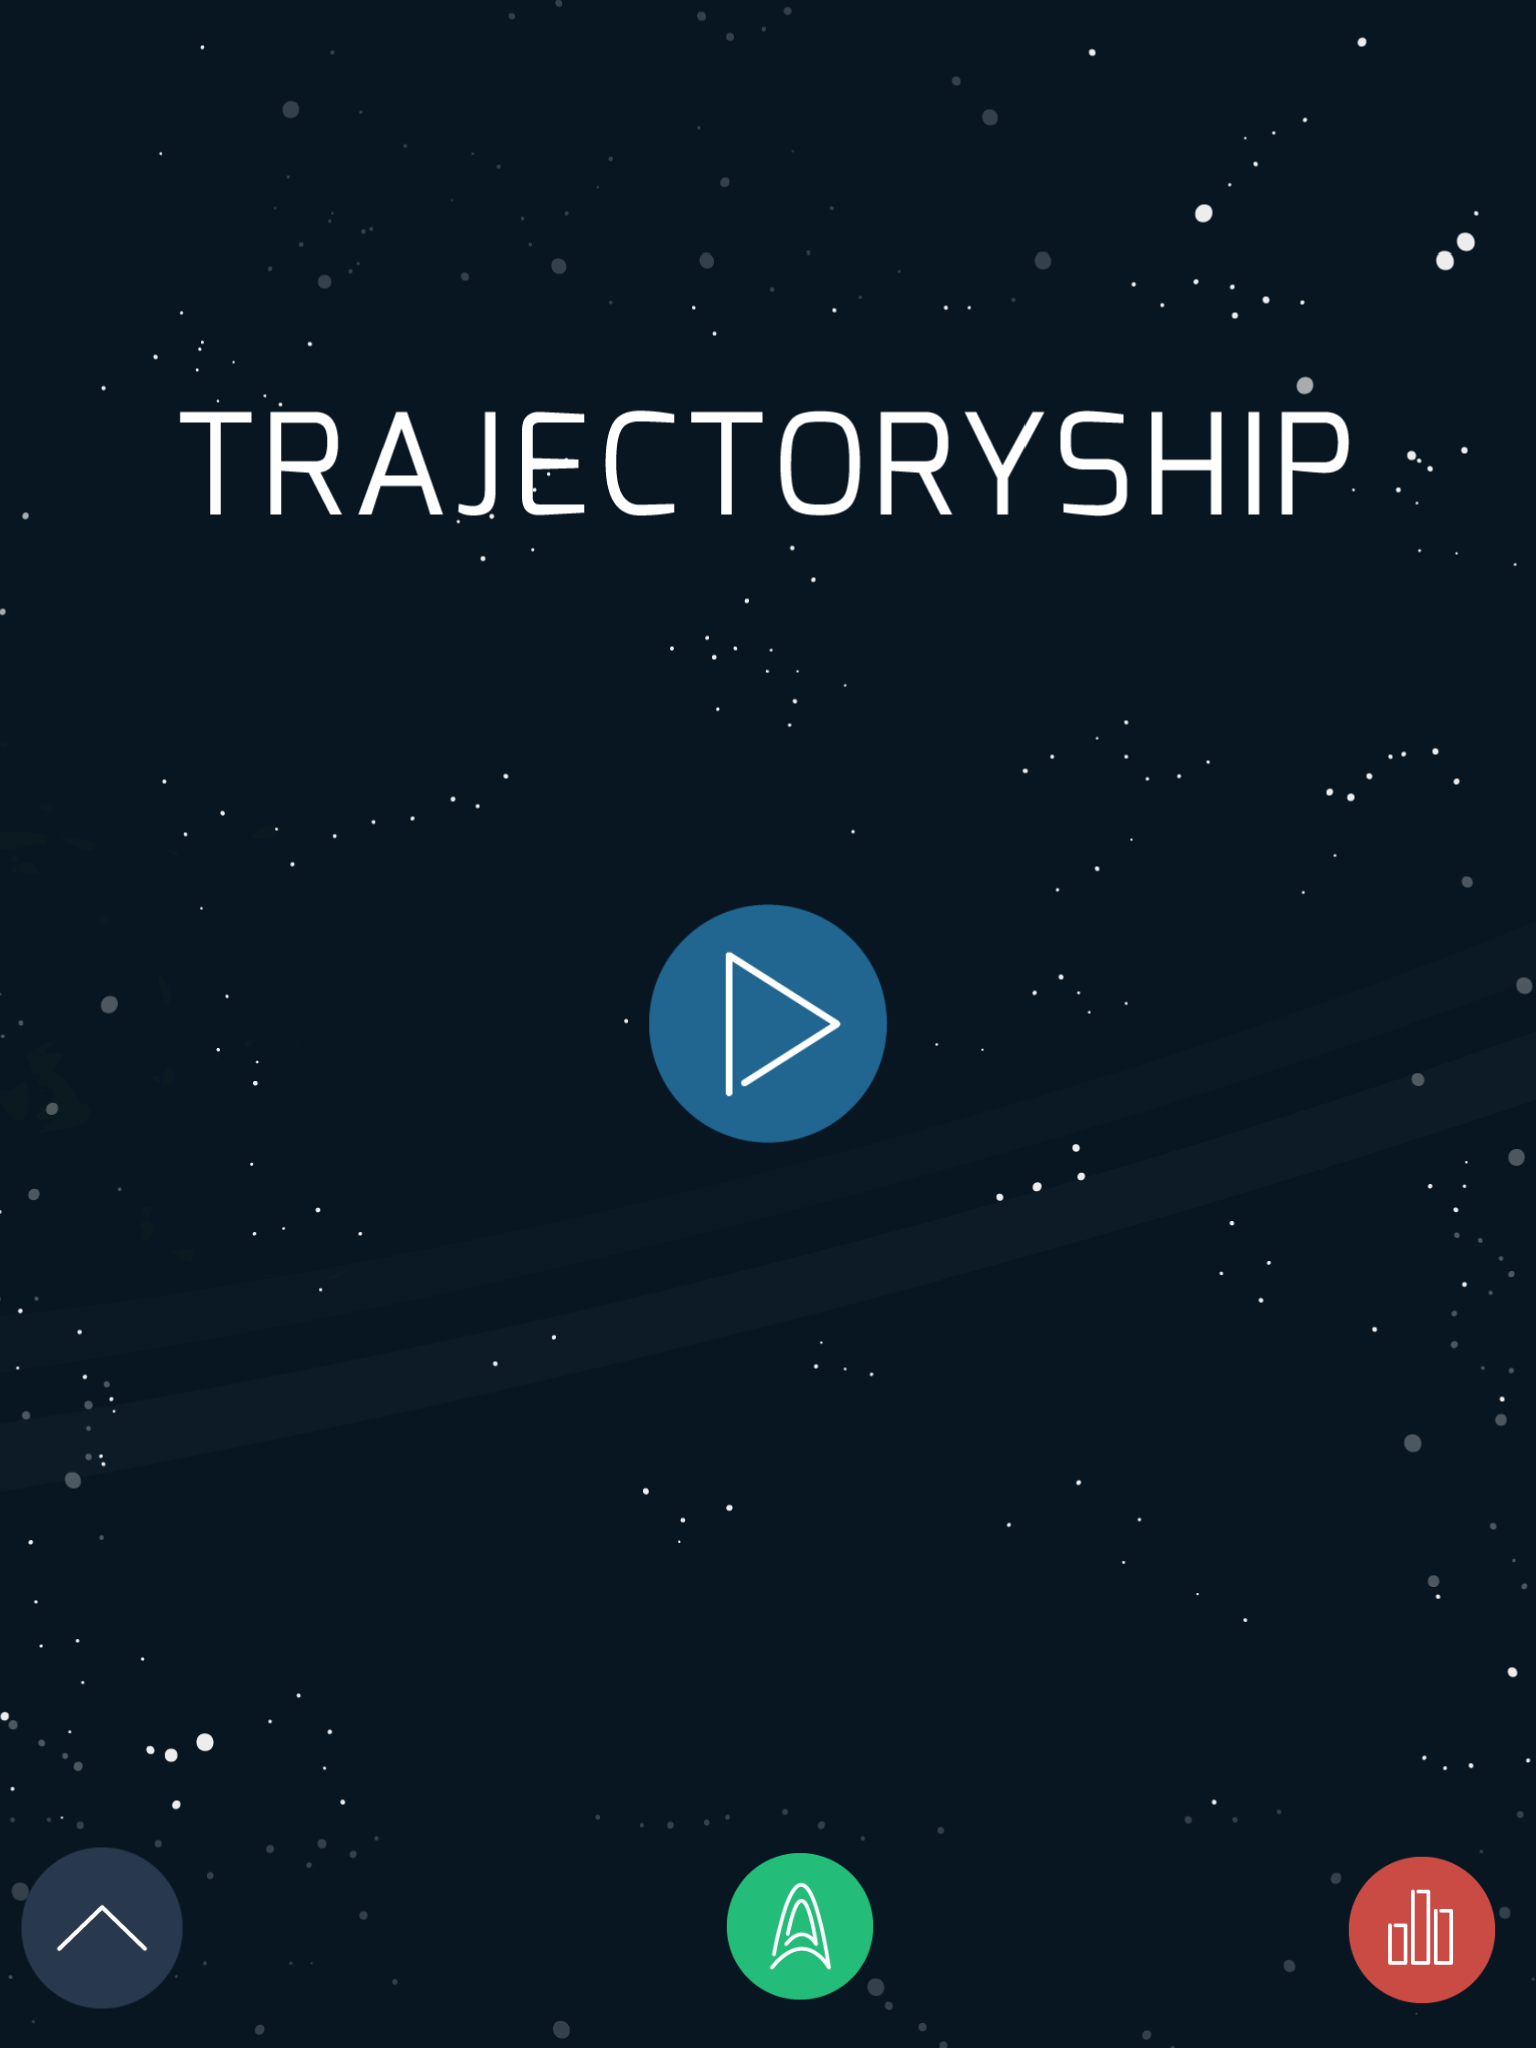 TrajectoryShip